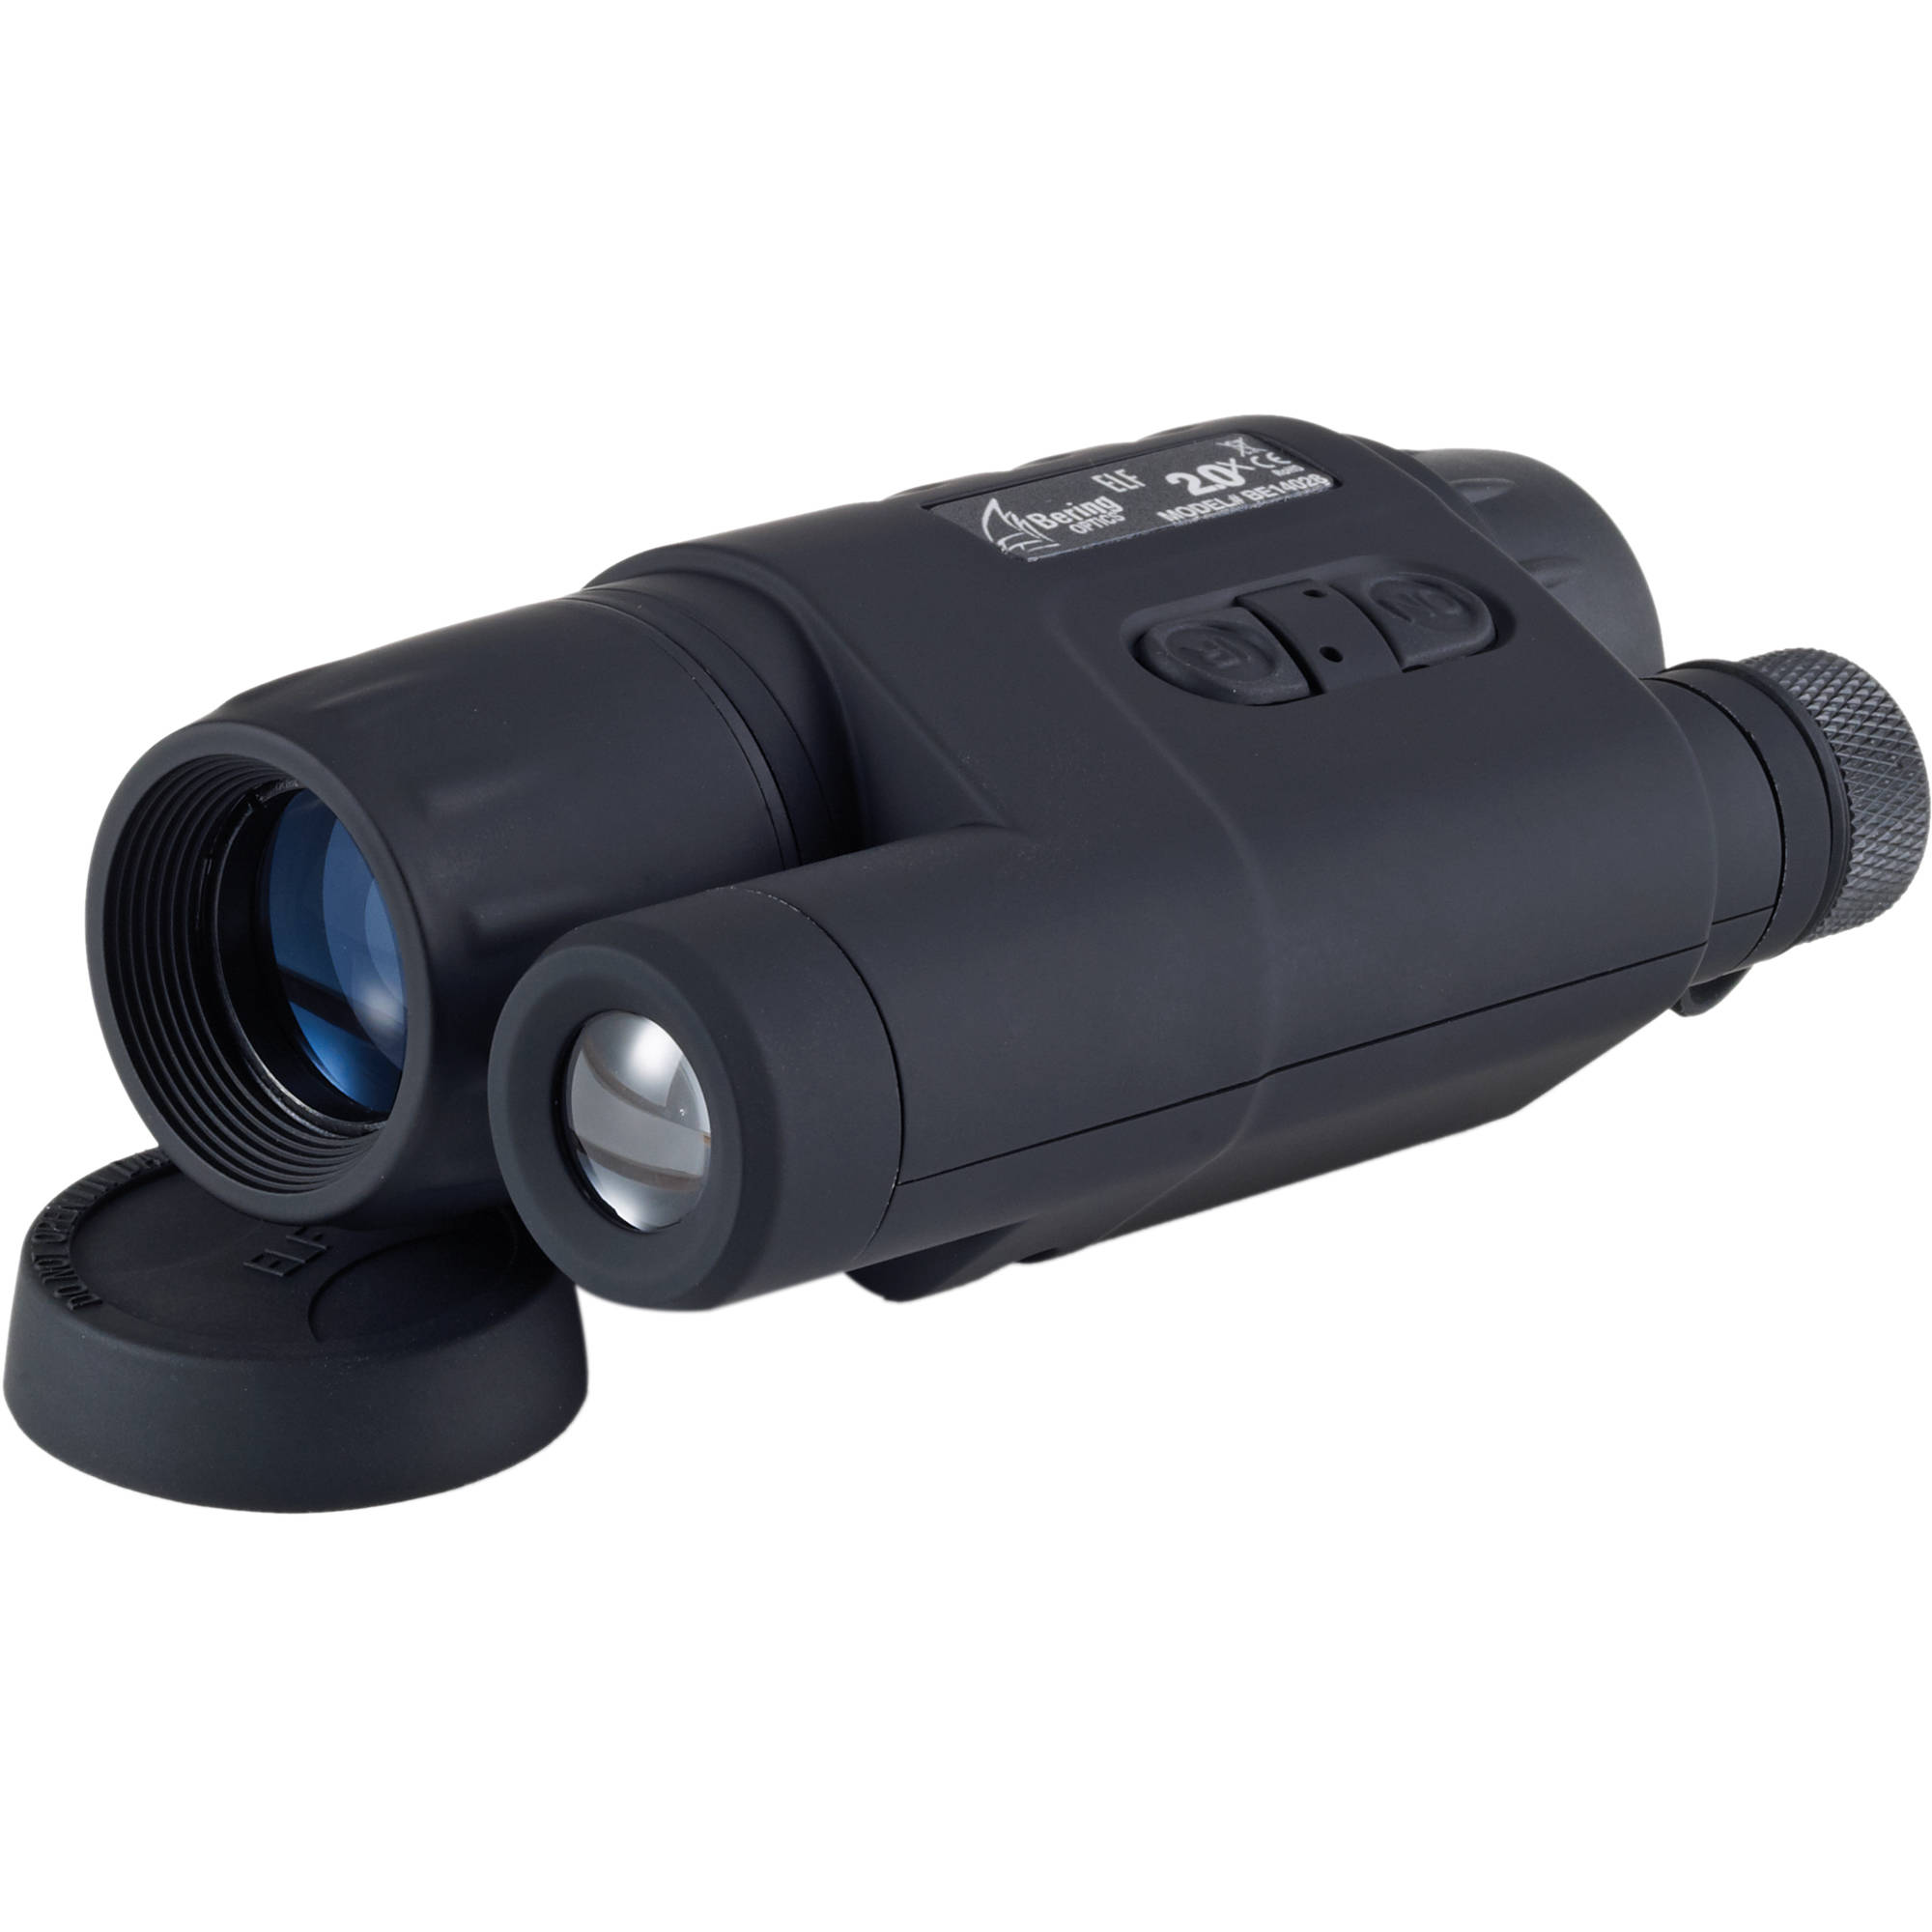 Bering Optics ELF2 2x 1st Generation Night Vision Monocular